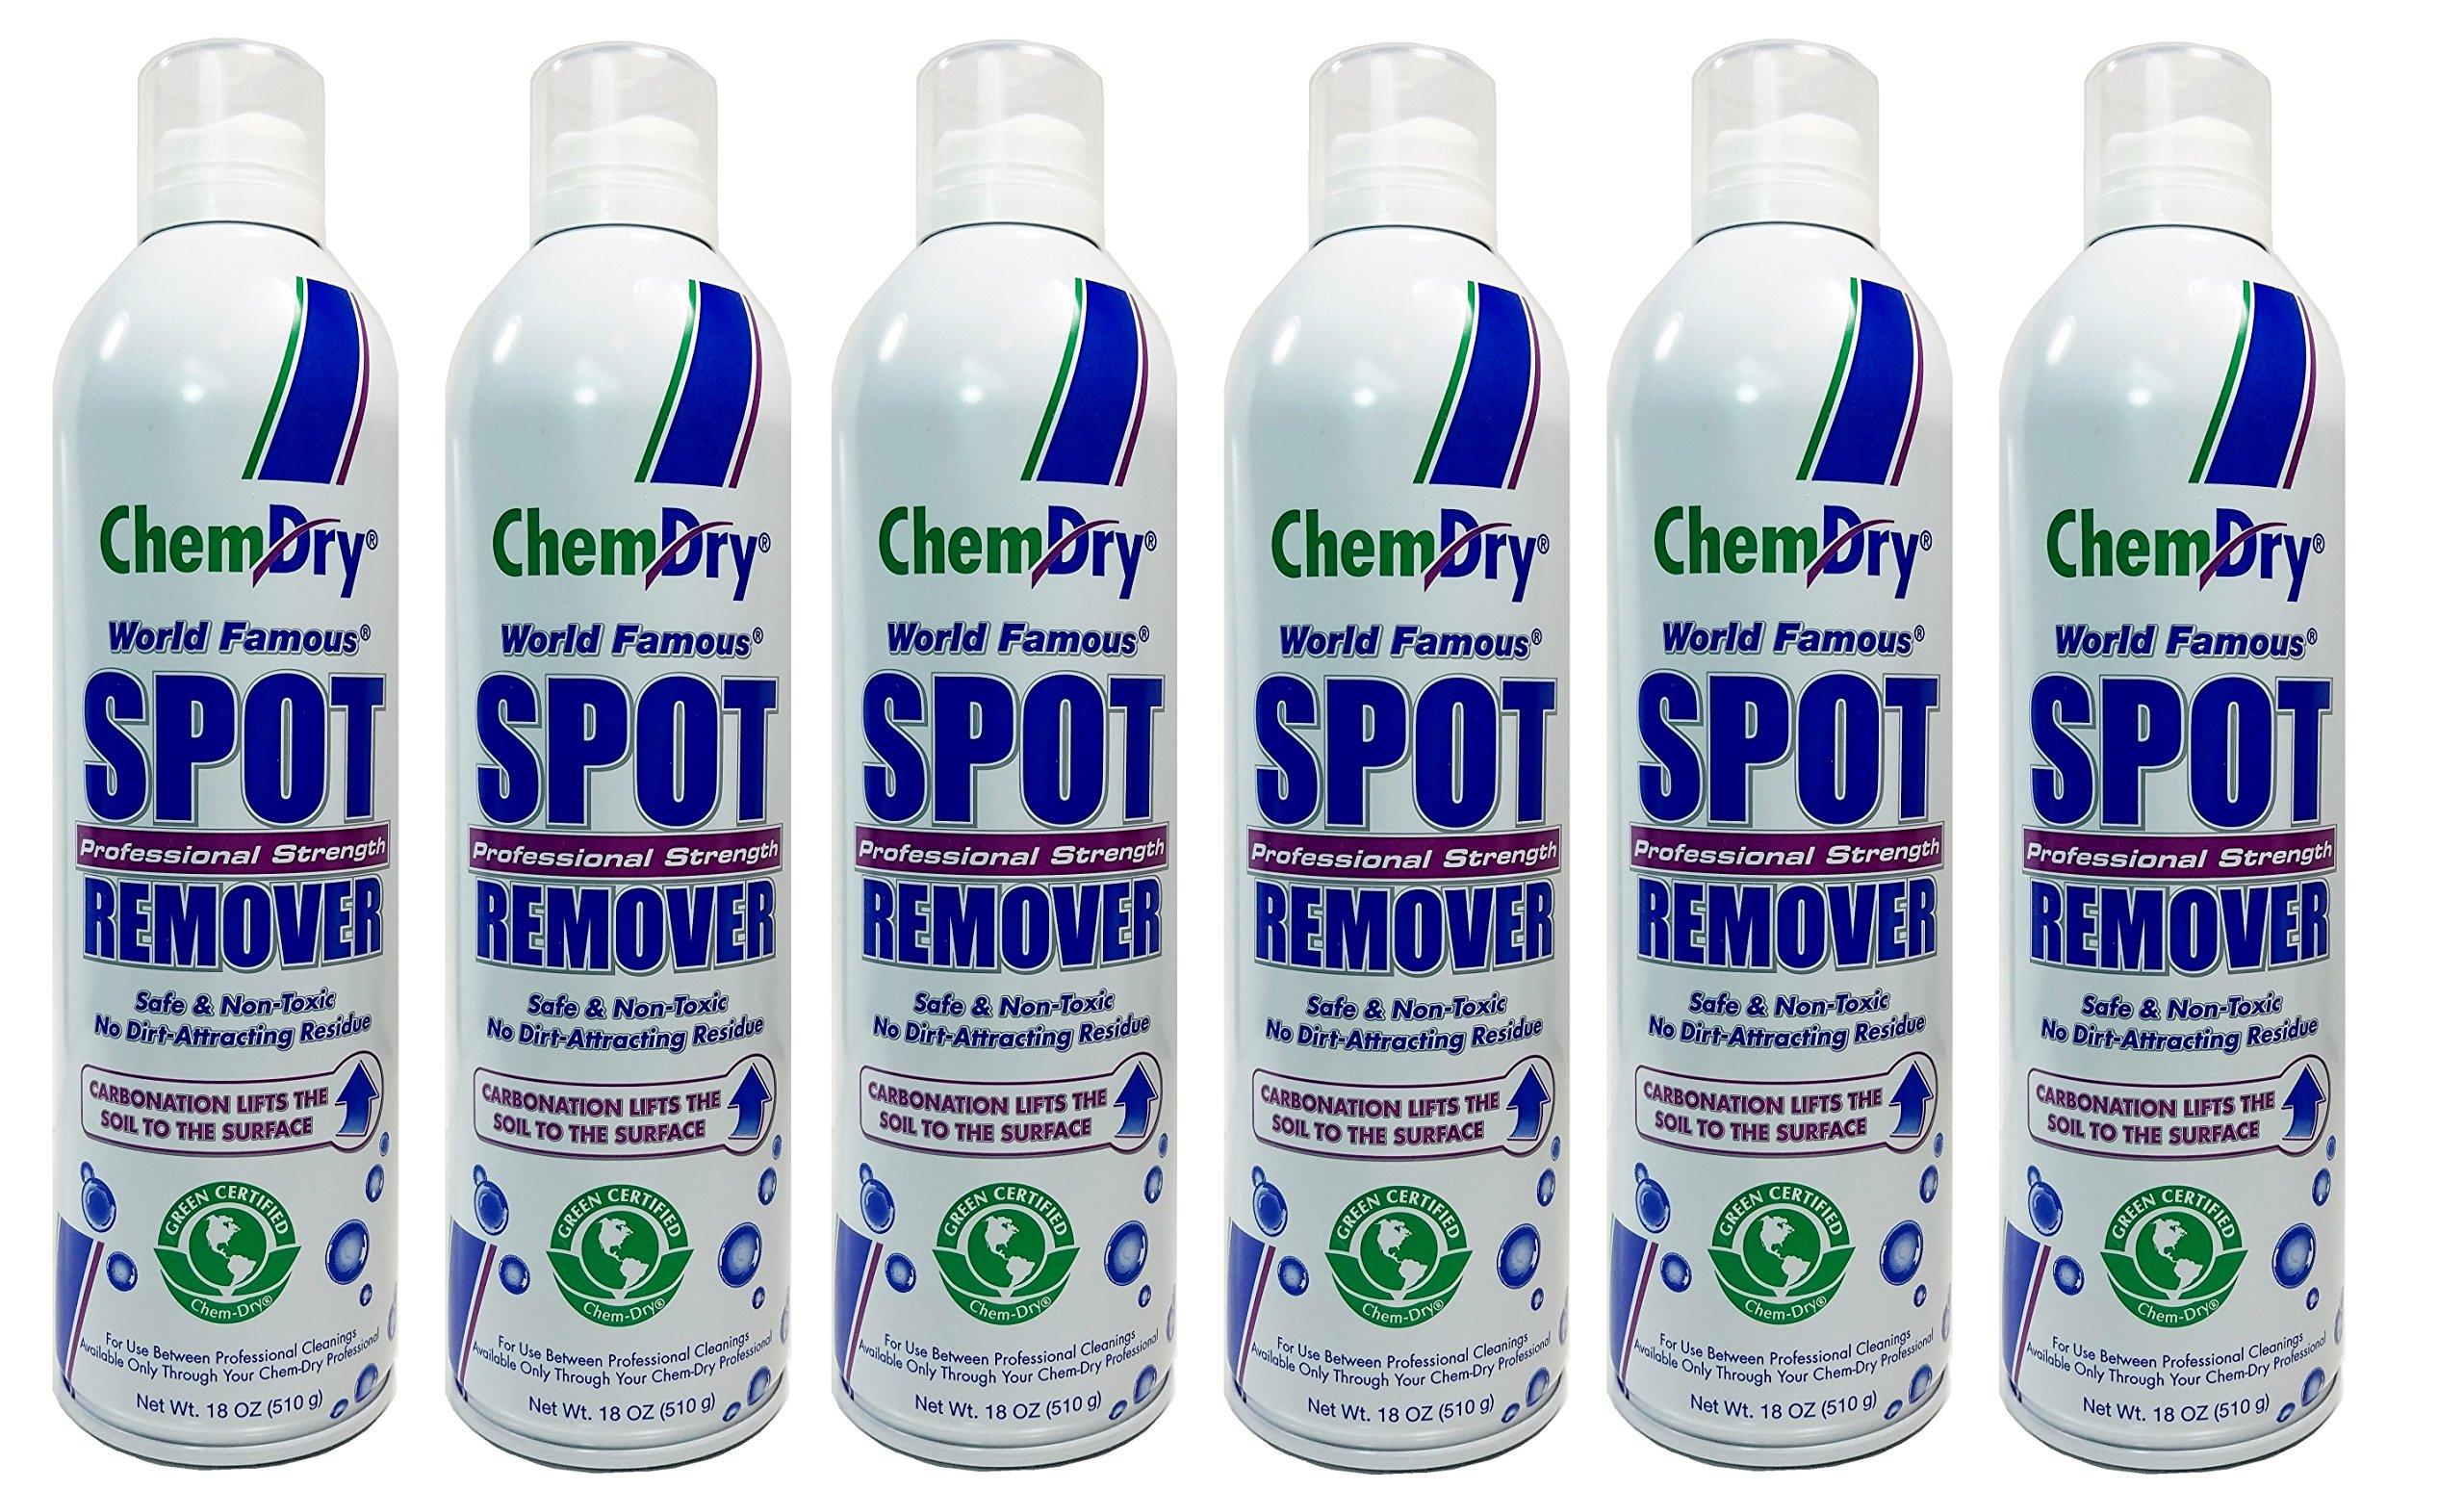 Chem-Dry Professional Strength Spot Remover 18oz (6 Pack)